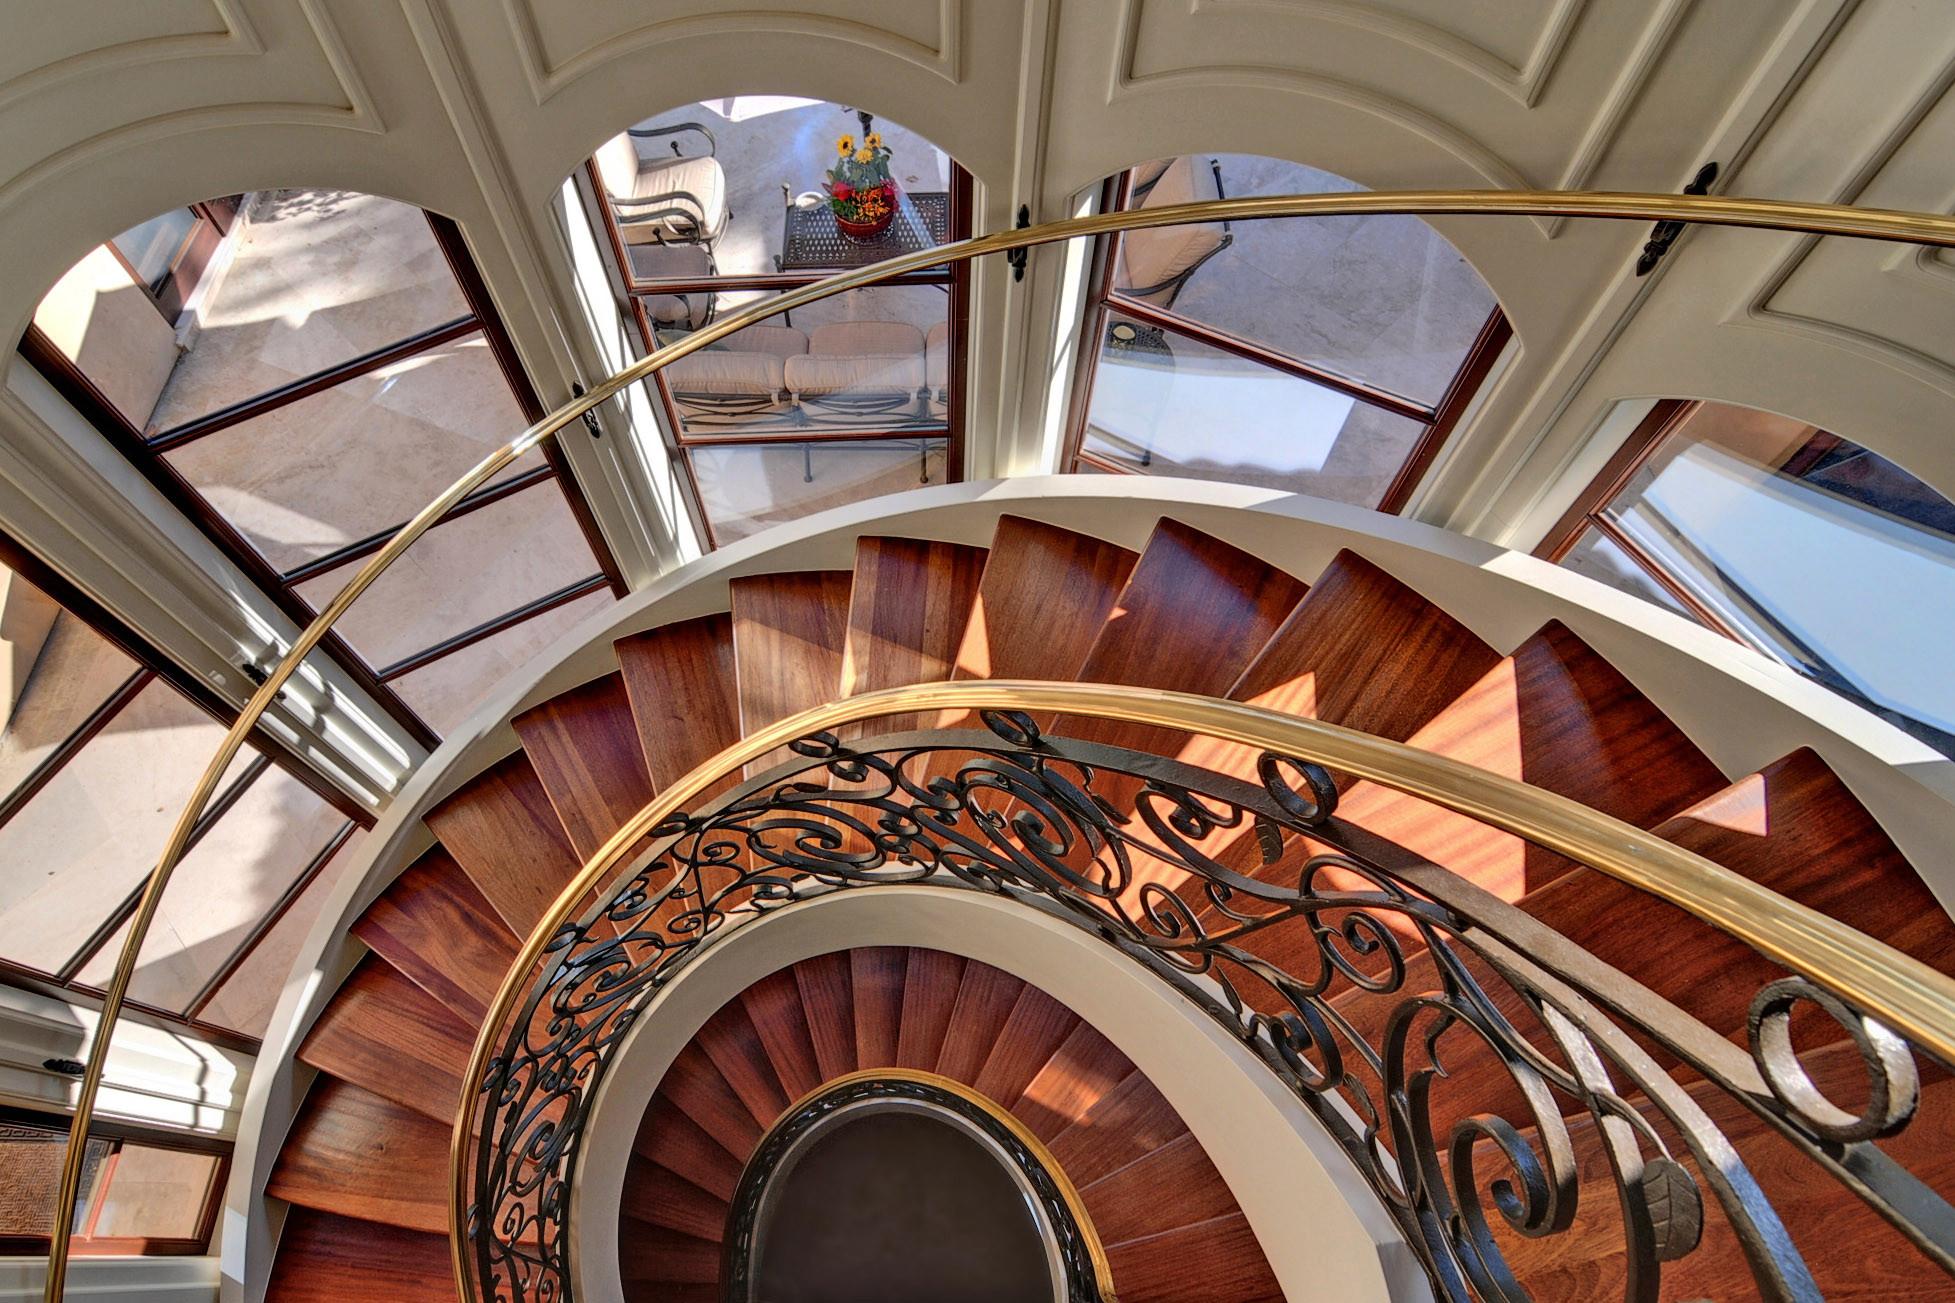 Staircase-1586910820-O.jpg